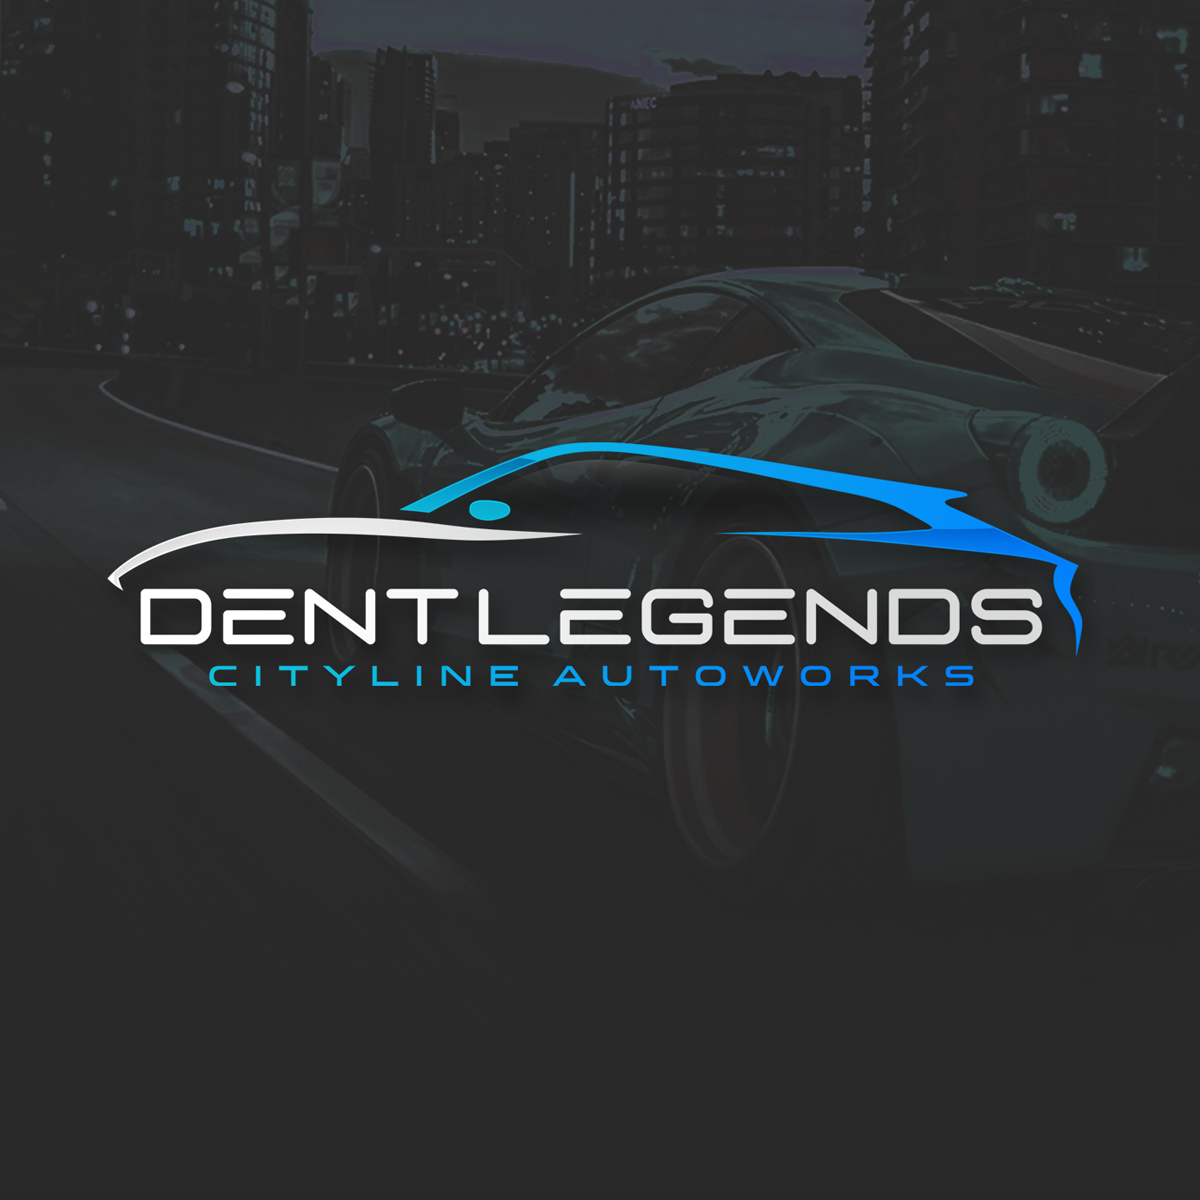 Dent Legends